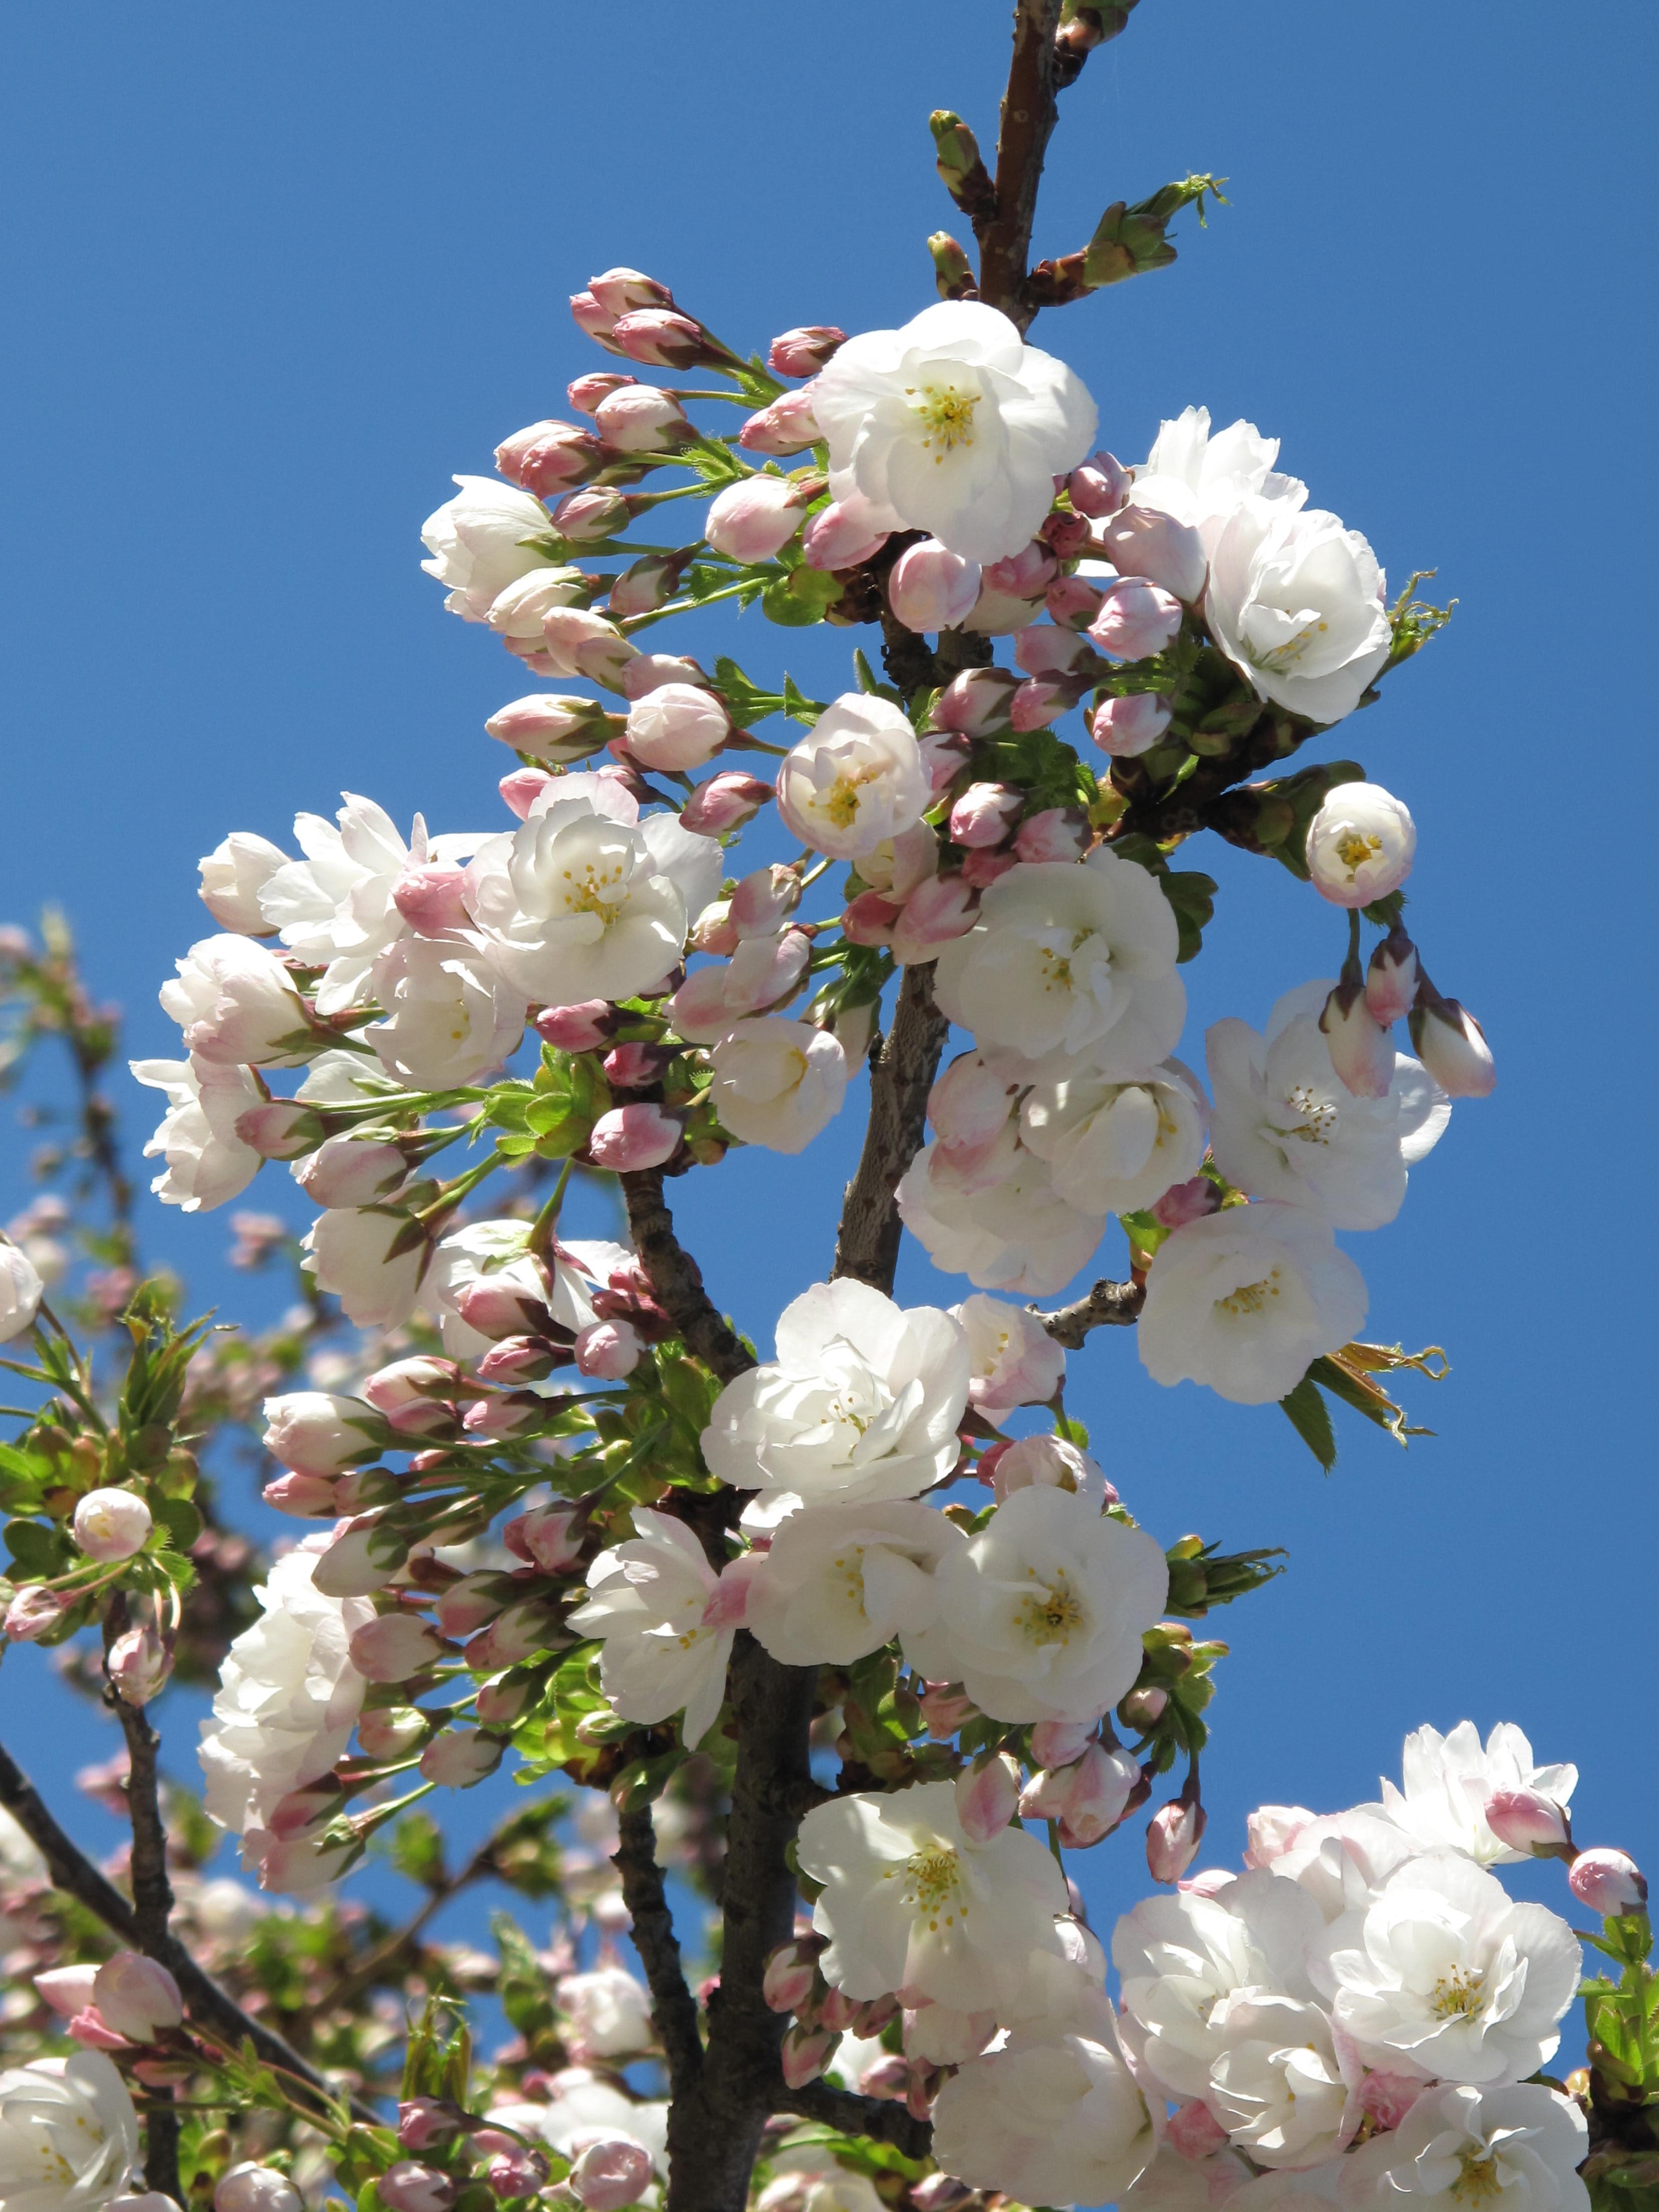 Prunus serrulata 'Shirotae'.